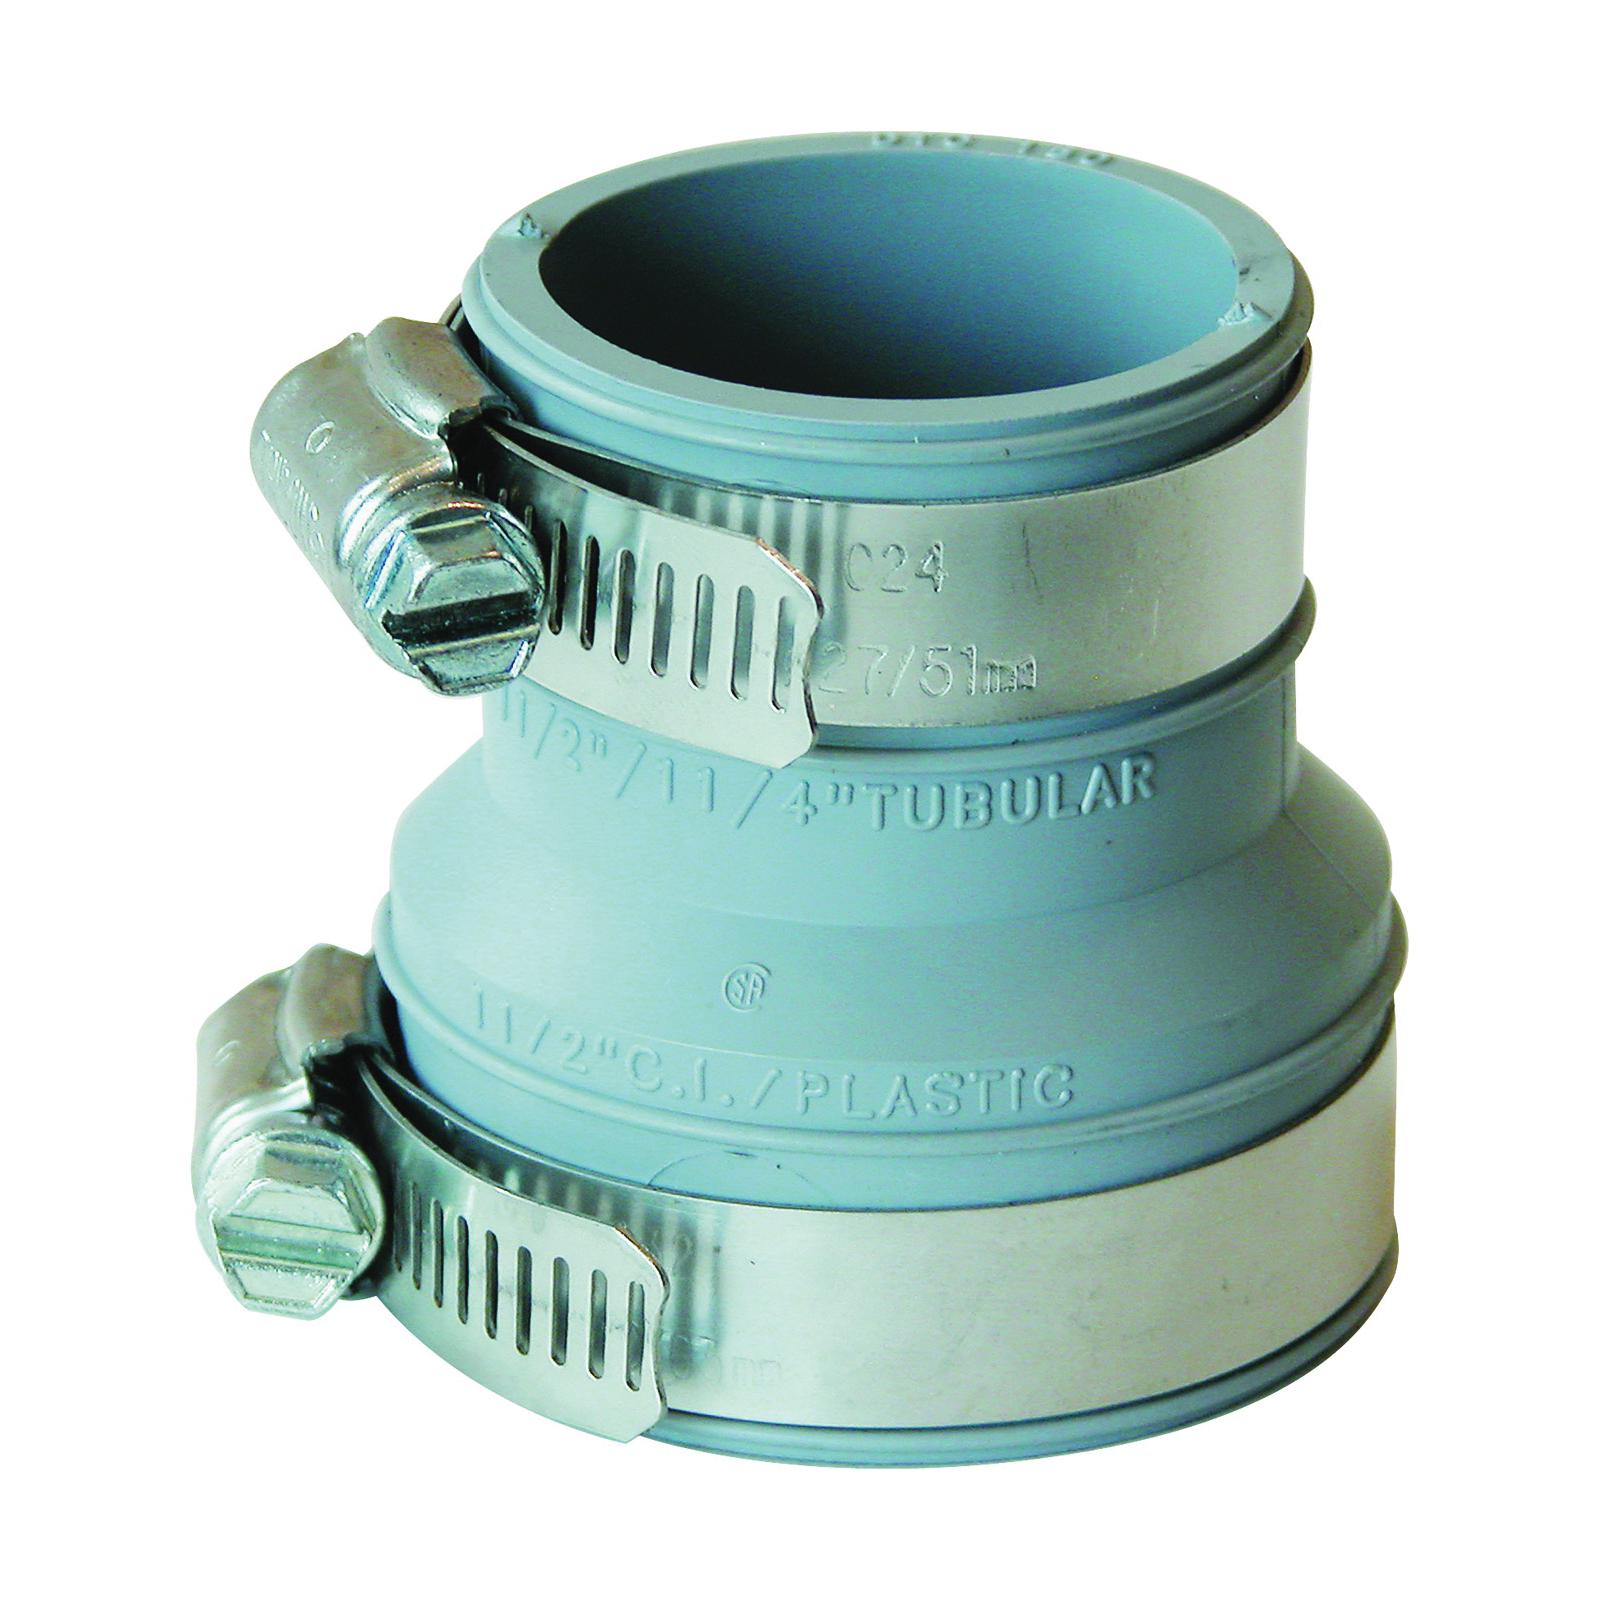 Picture of FERNCO PDTC-150 Drain Trap Connector, 1-1/2 in, PVC, 4.3 psi Pressure